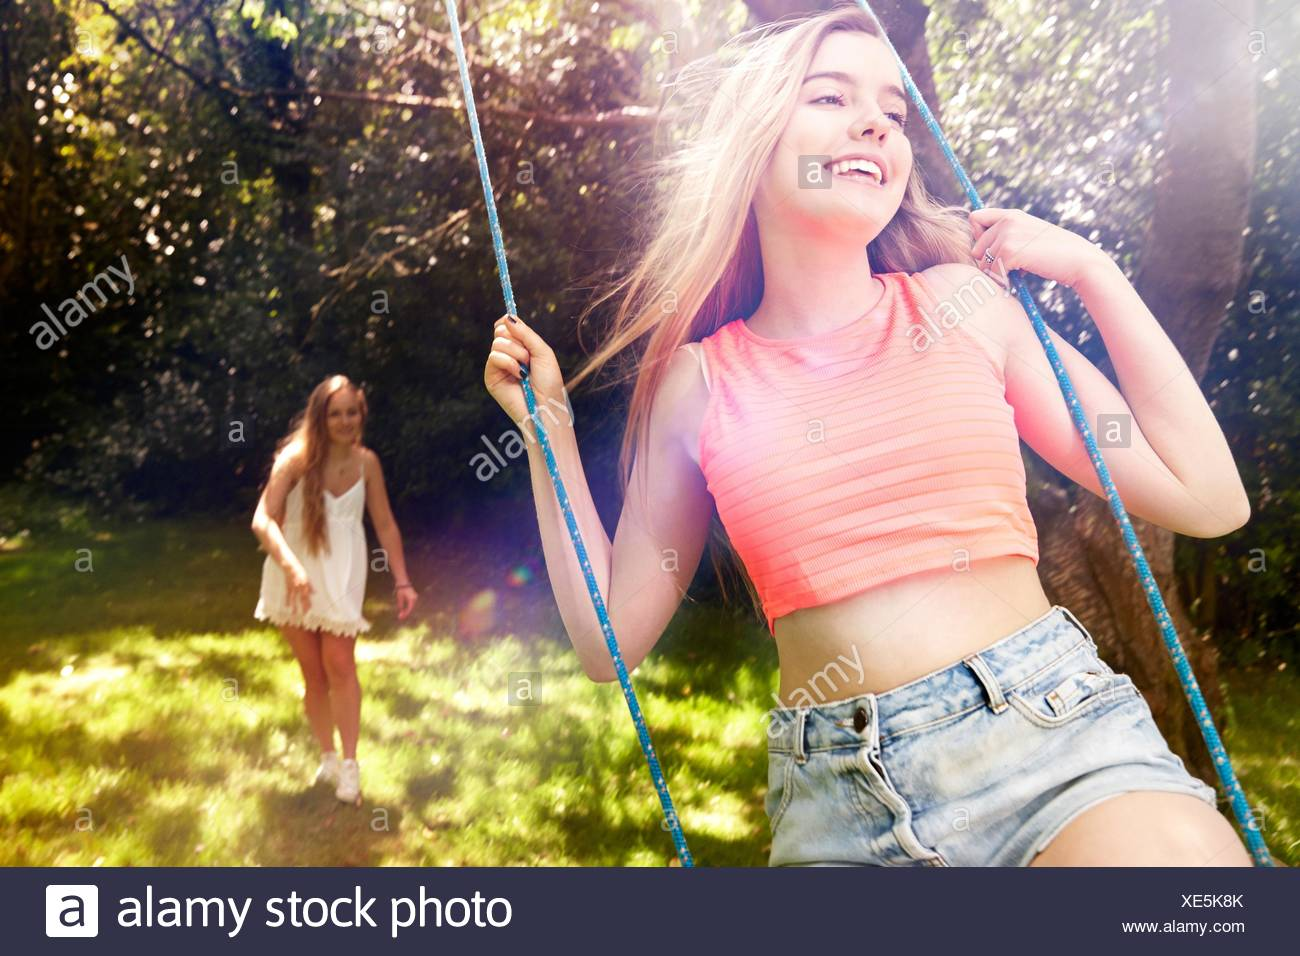 Teenage girl pushing her friend on tree swing - Stock Image